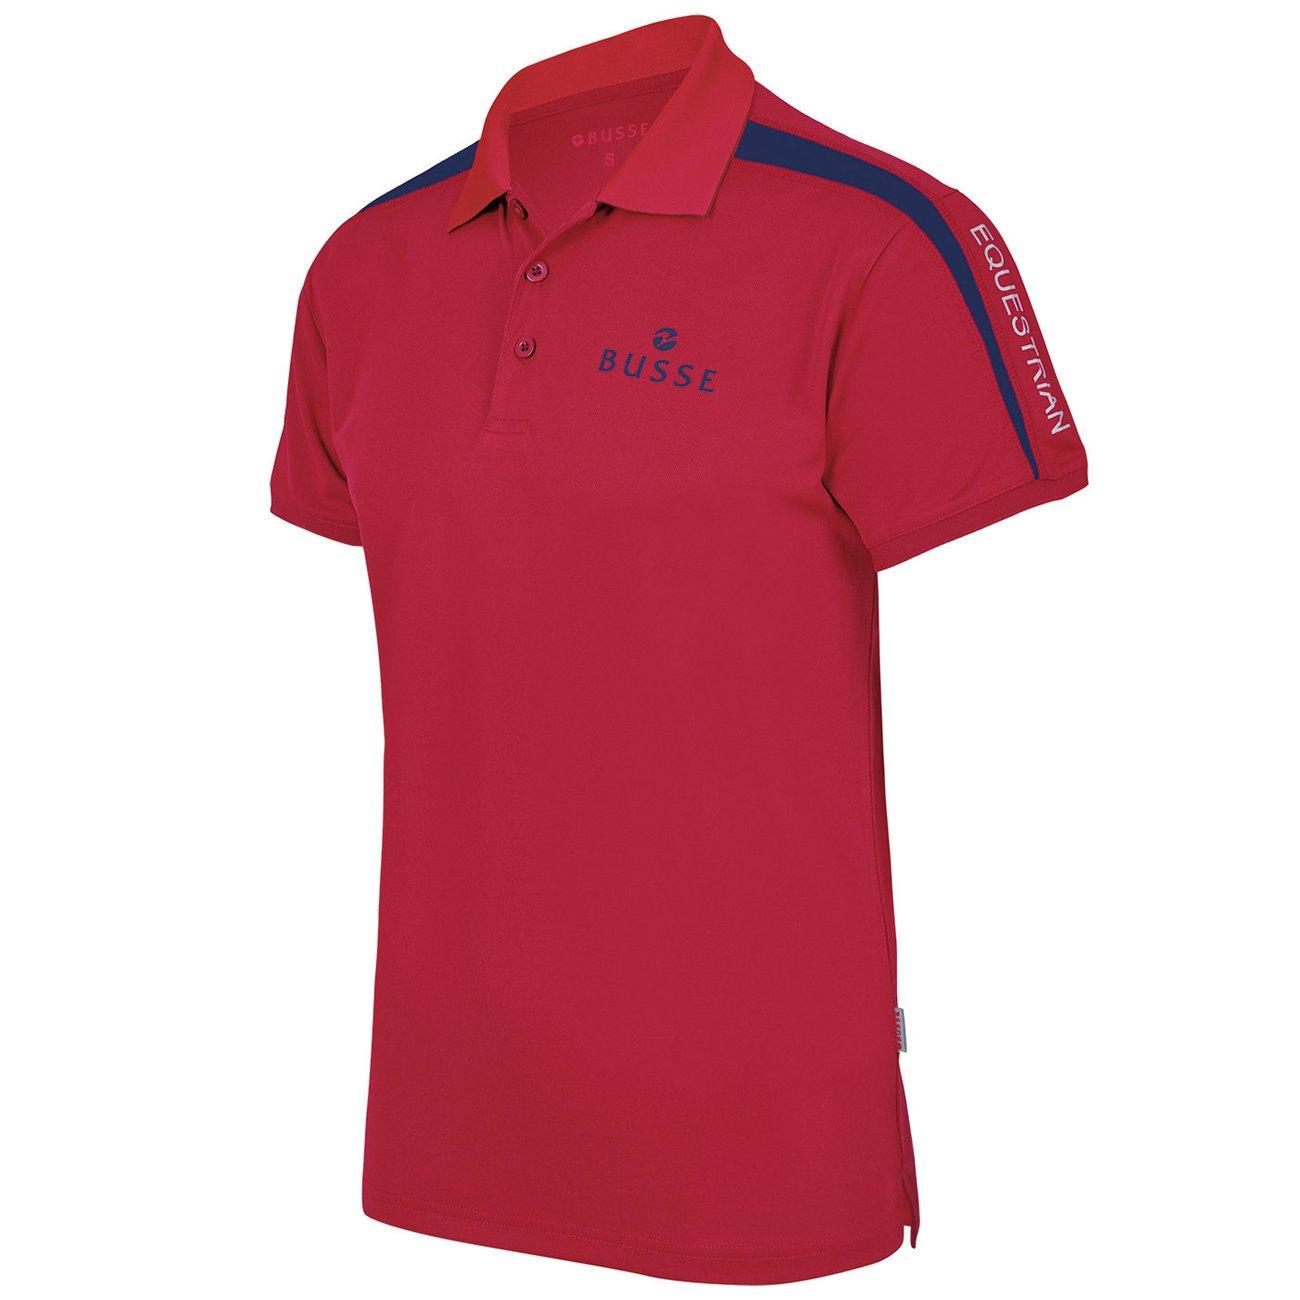 BUSSE Polo Shirt Harper Tech, Bild 3